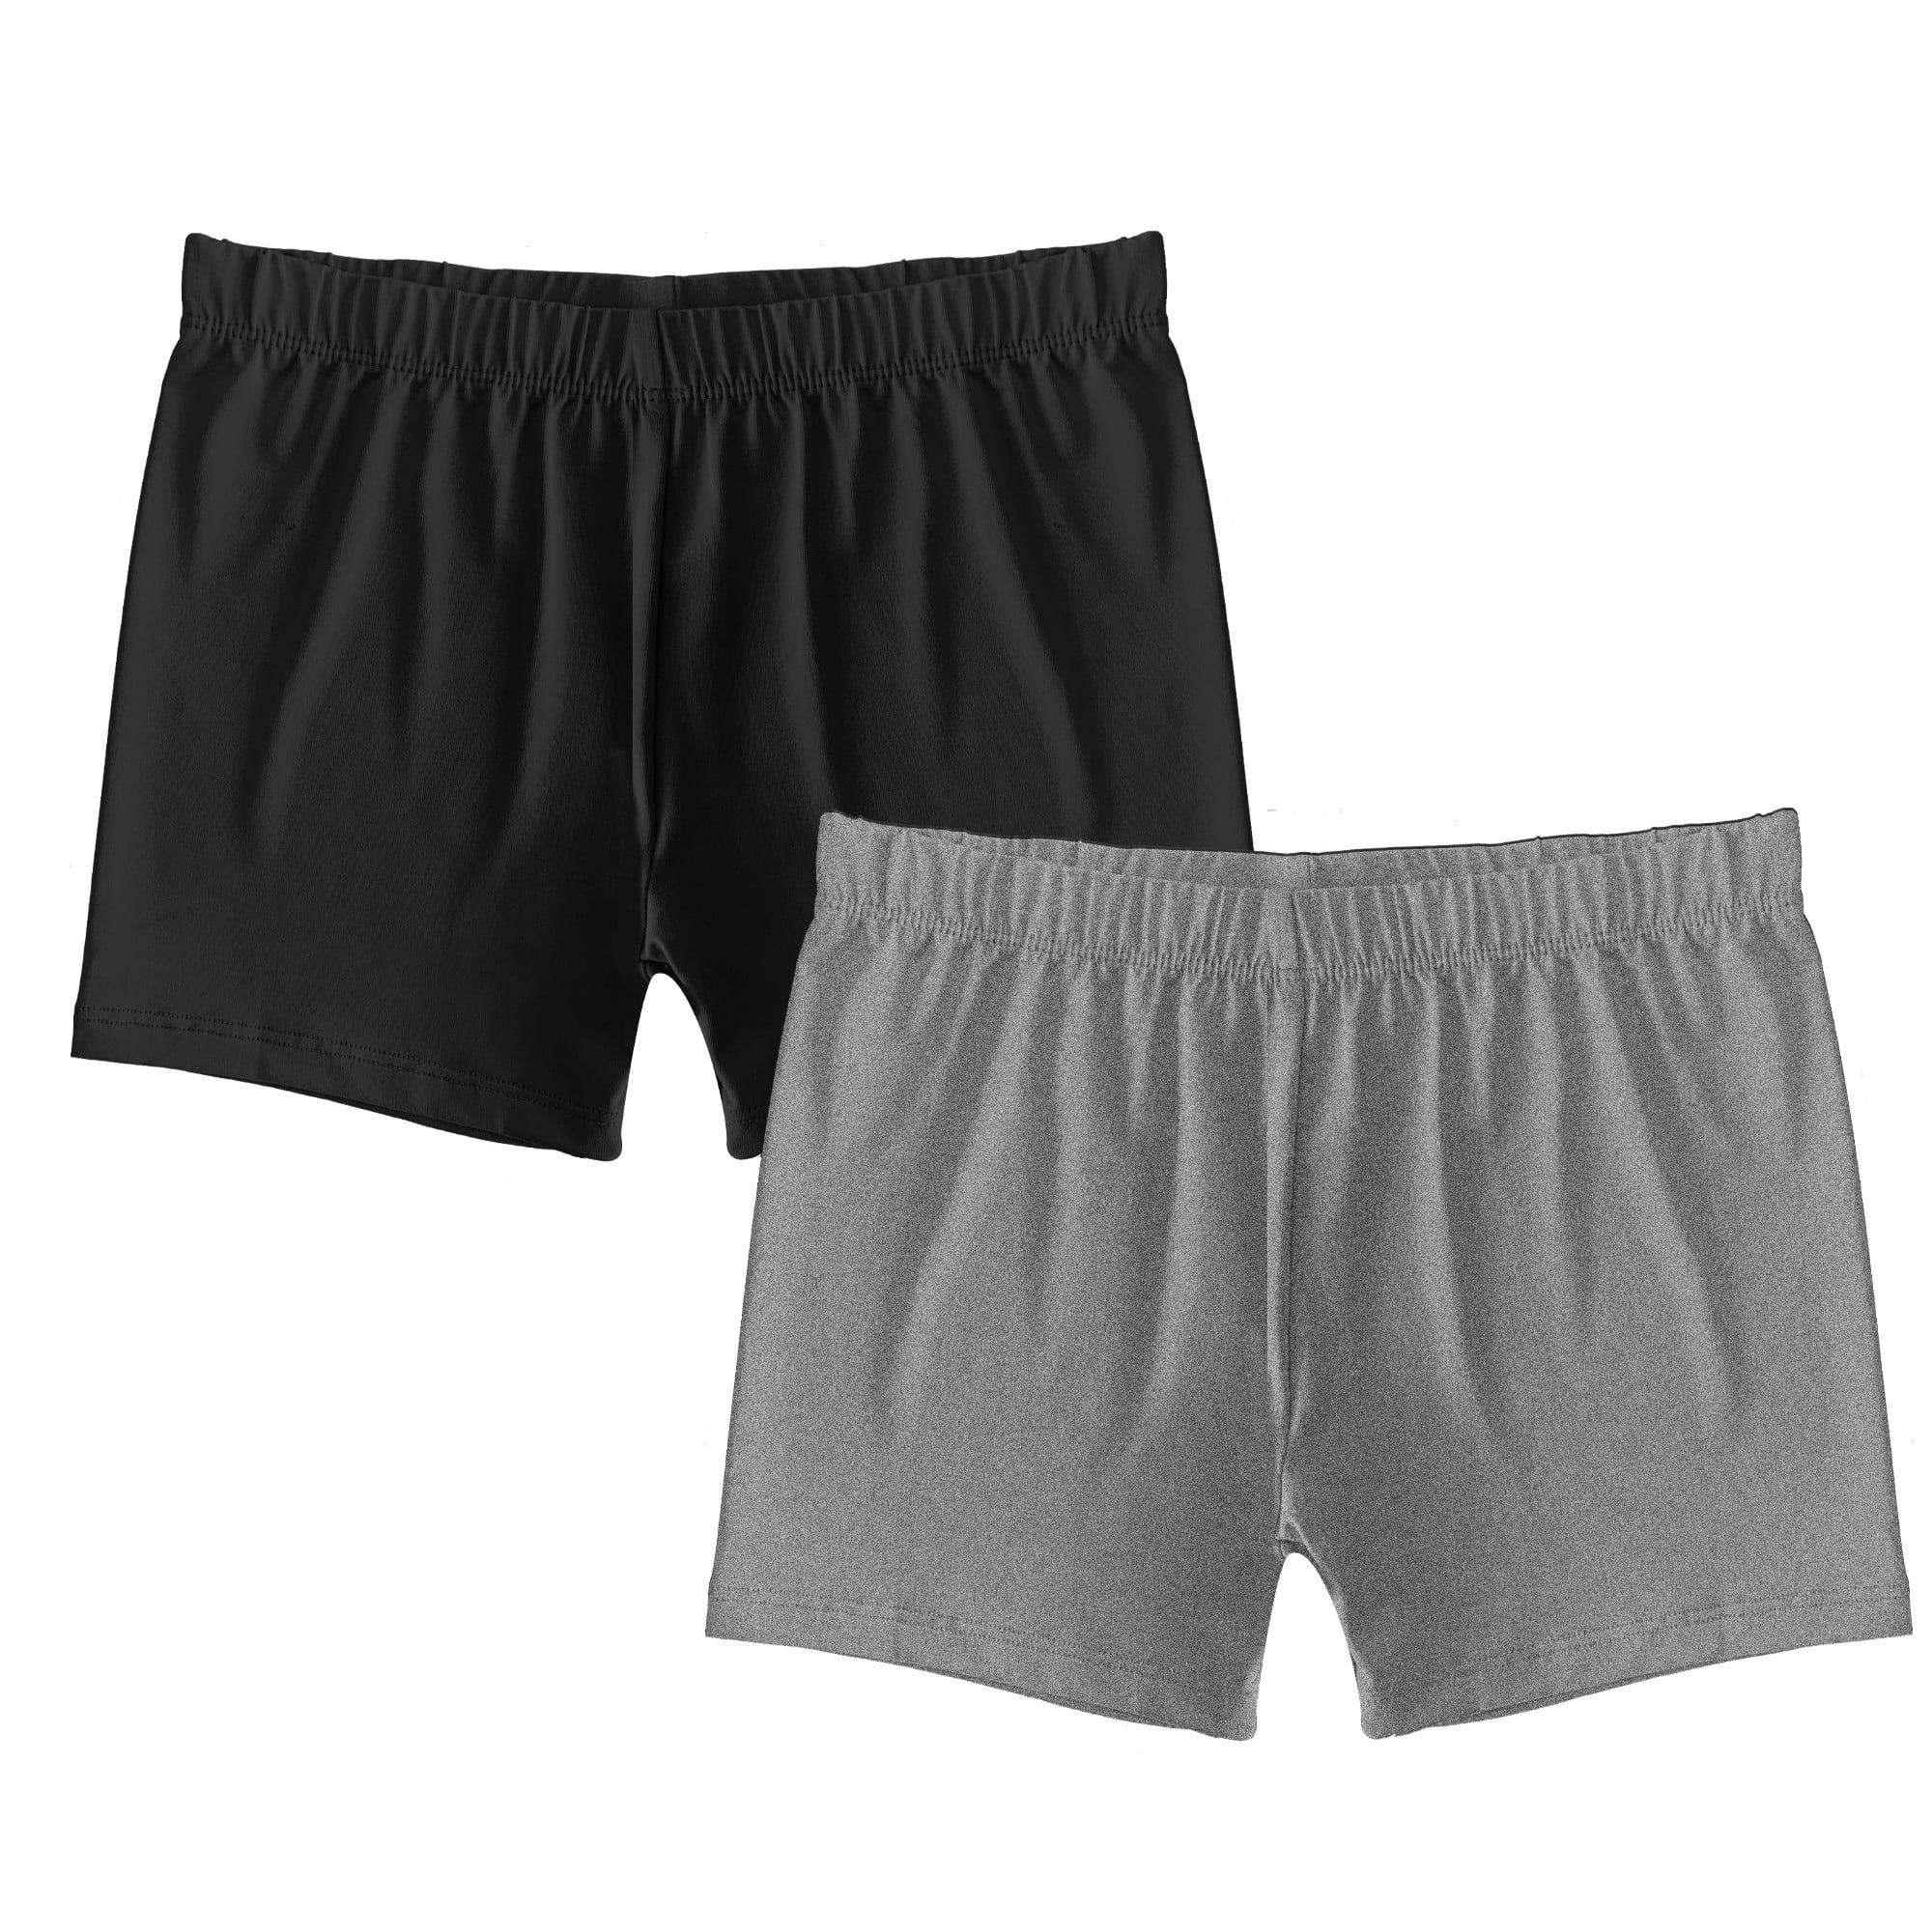 Popular Popular Girl S Playground Under Dress Shorts 2 Pack Walmart Com Walmart Com [ 2000 x 2000 Pixel ]